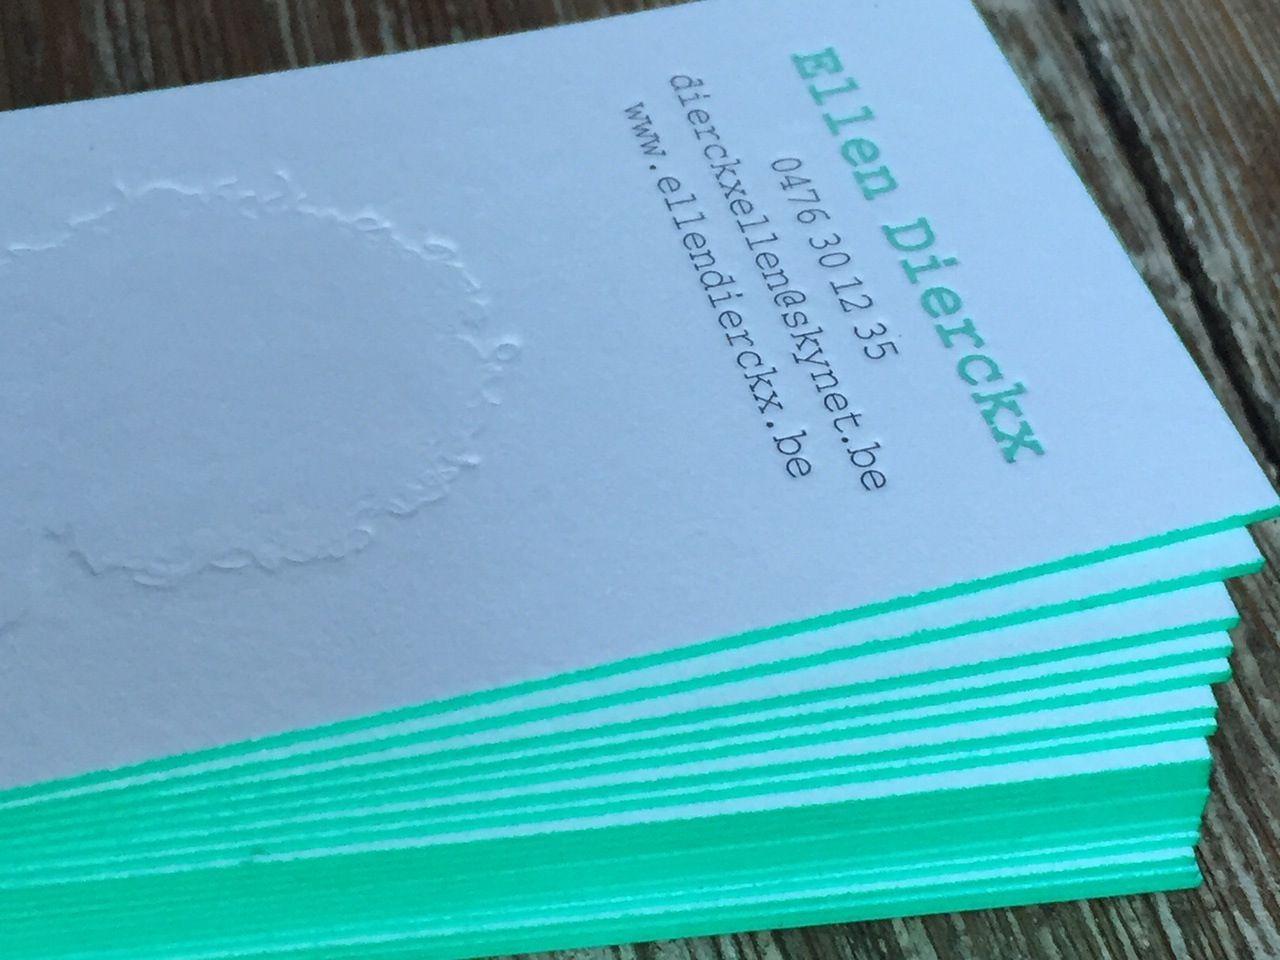 Business card ellen dierckx letterpress printing and edge coloring business card ellen dierckx letterpress printing and edge coloring mint green by letterpressgust reheart Image collections